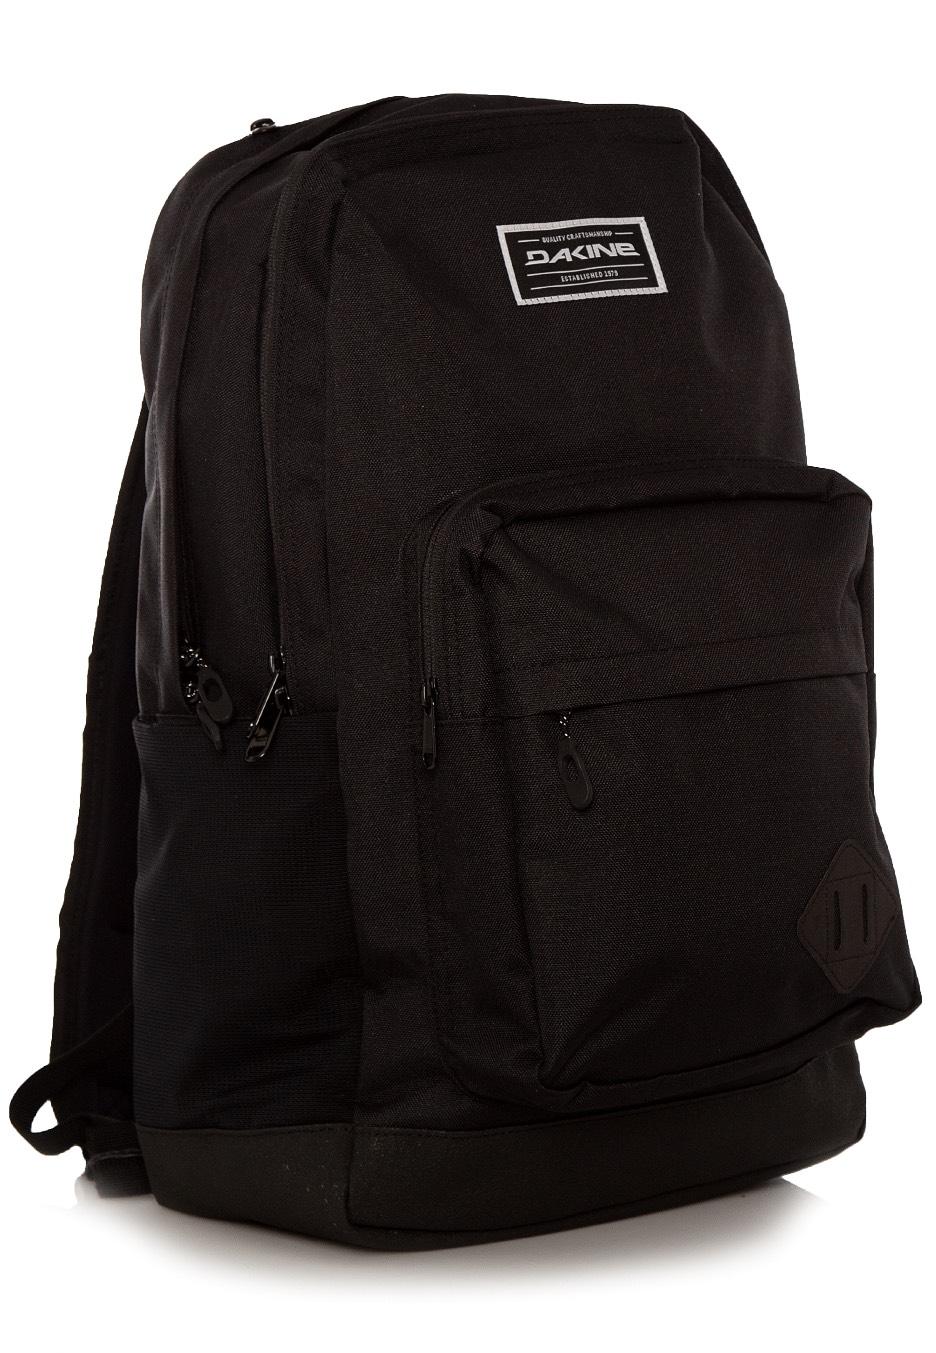 95b2088cd7 Dakine - 365 Pack DLX 27L Black - Backpack - Impericon.com US